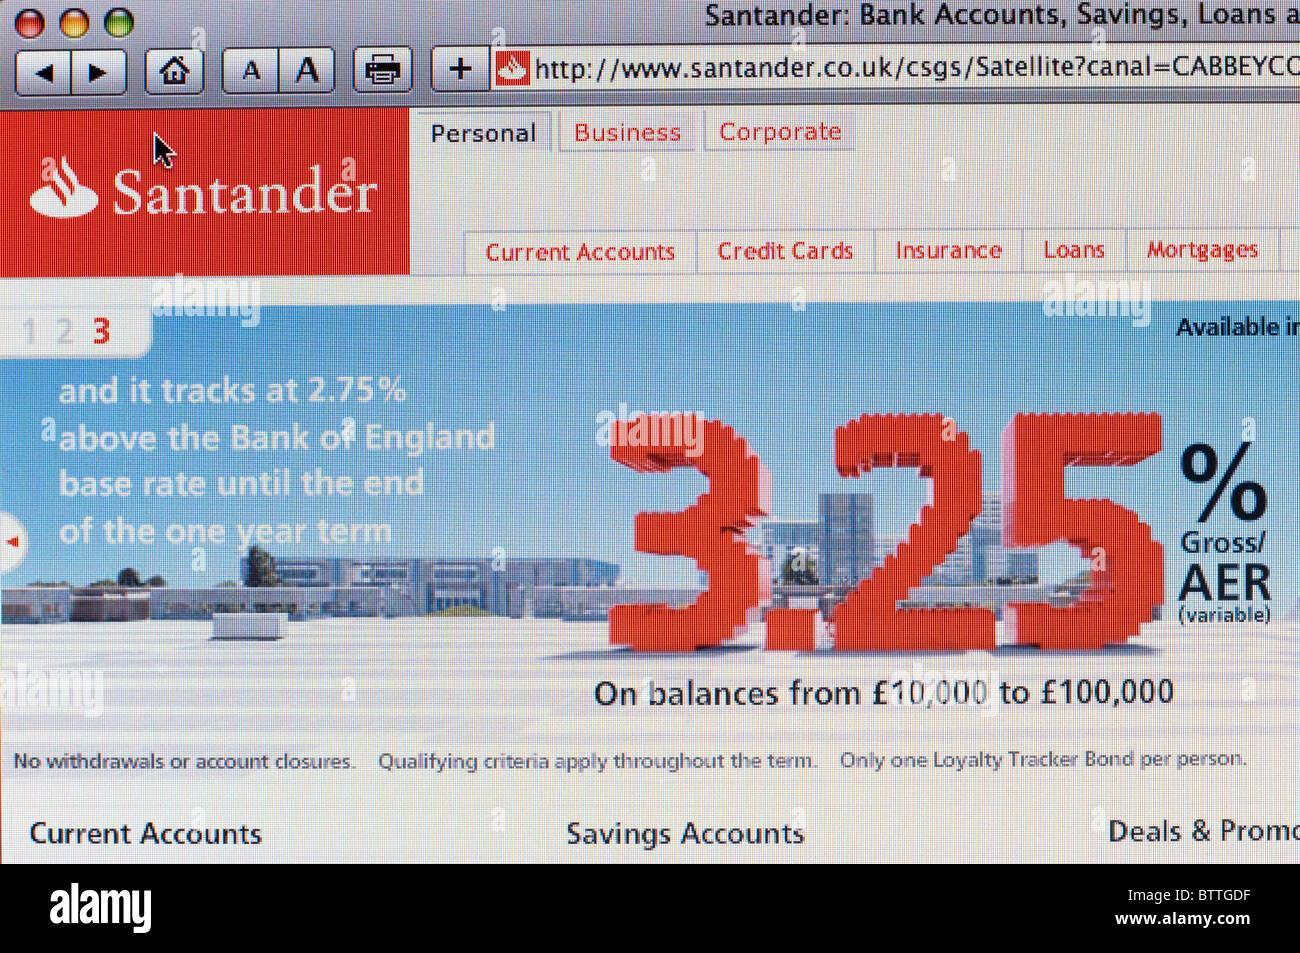 Santander Internetbanking